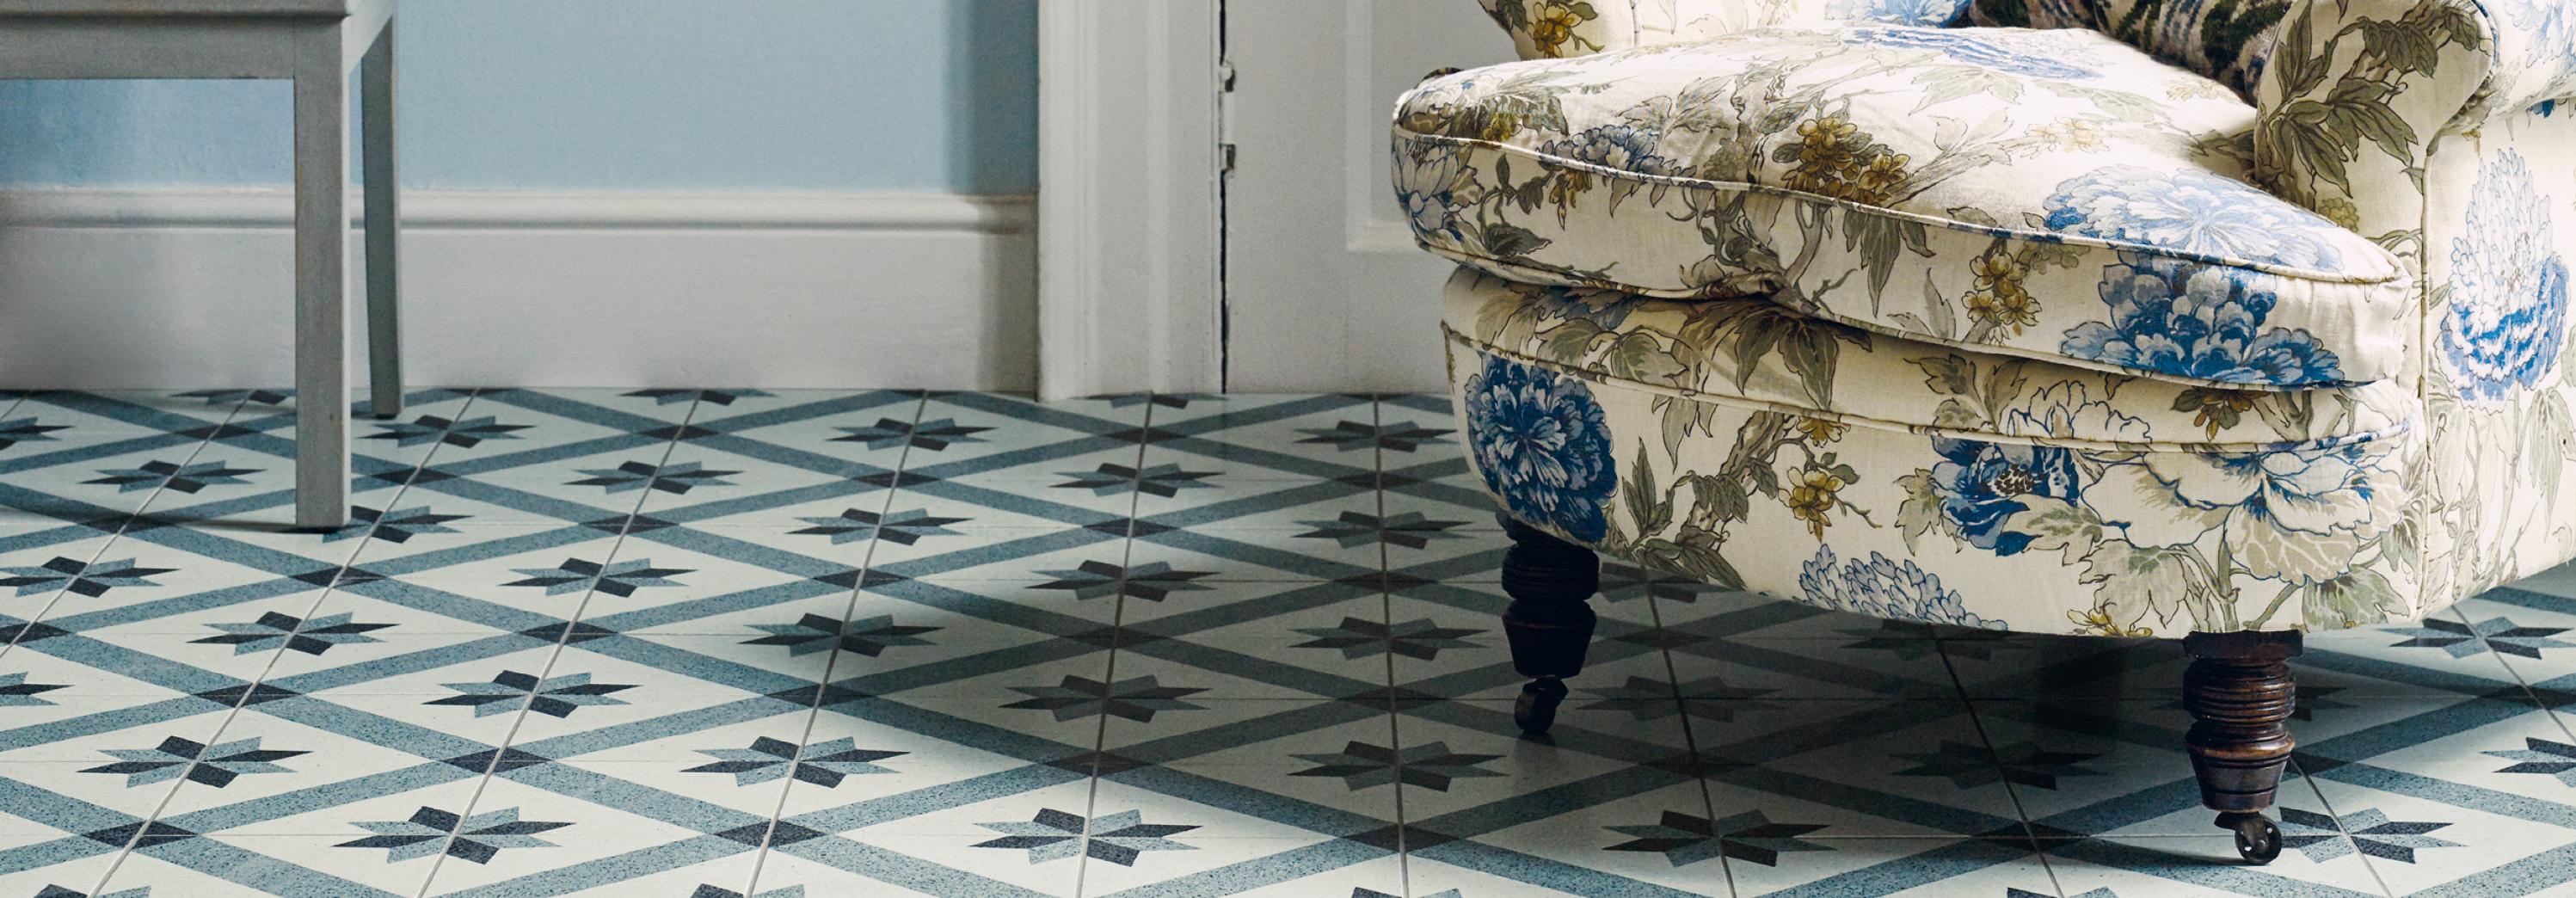 Terrazzo Stunning Terrazzo Floor Tiles Made From Marble